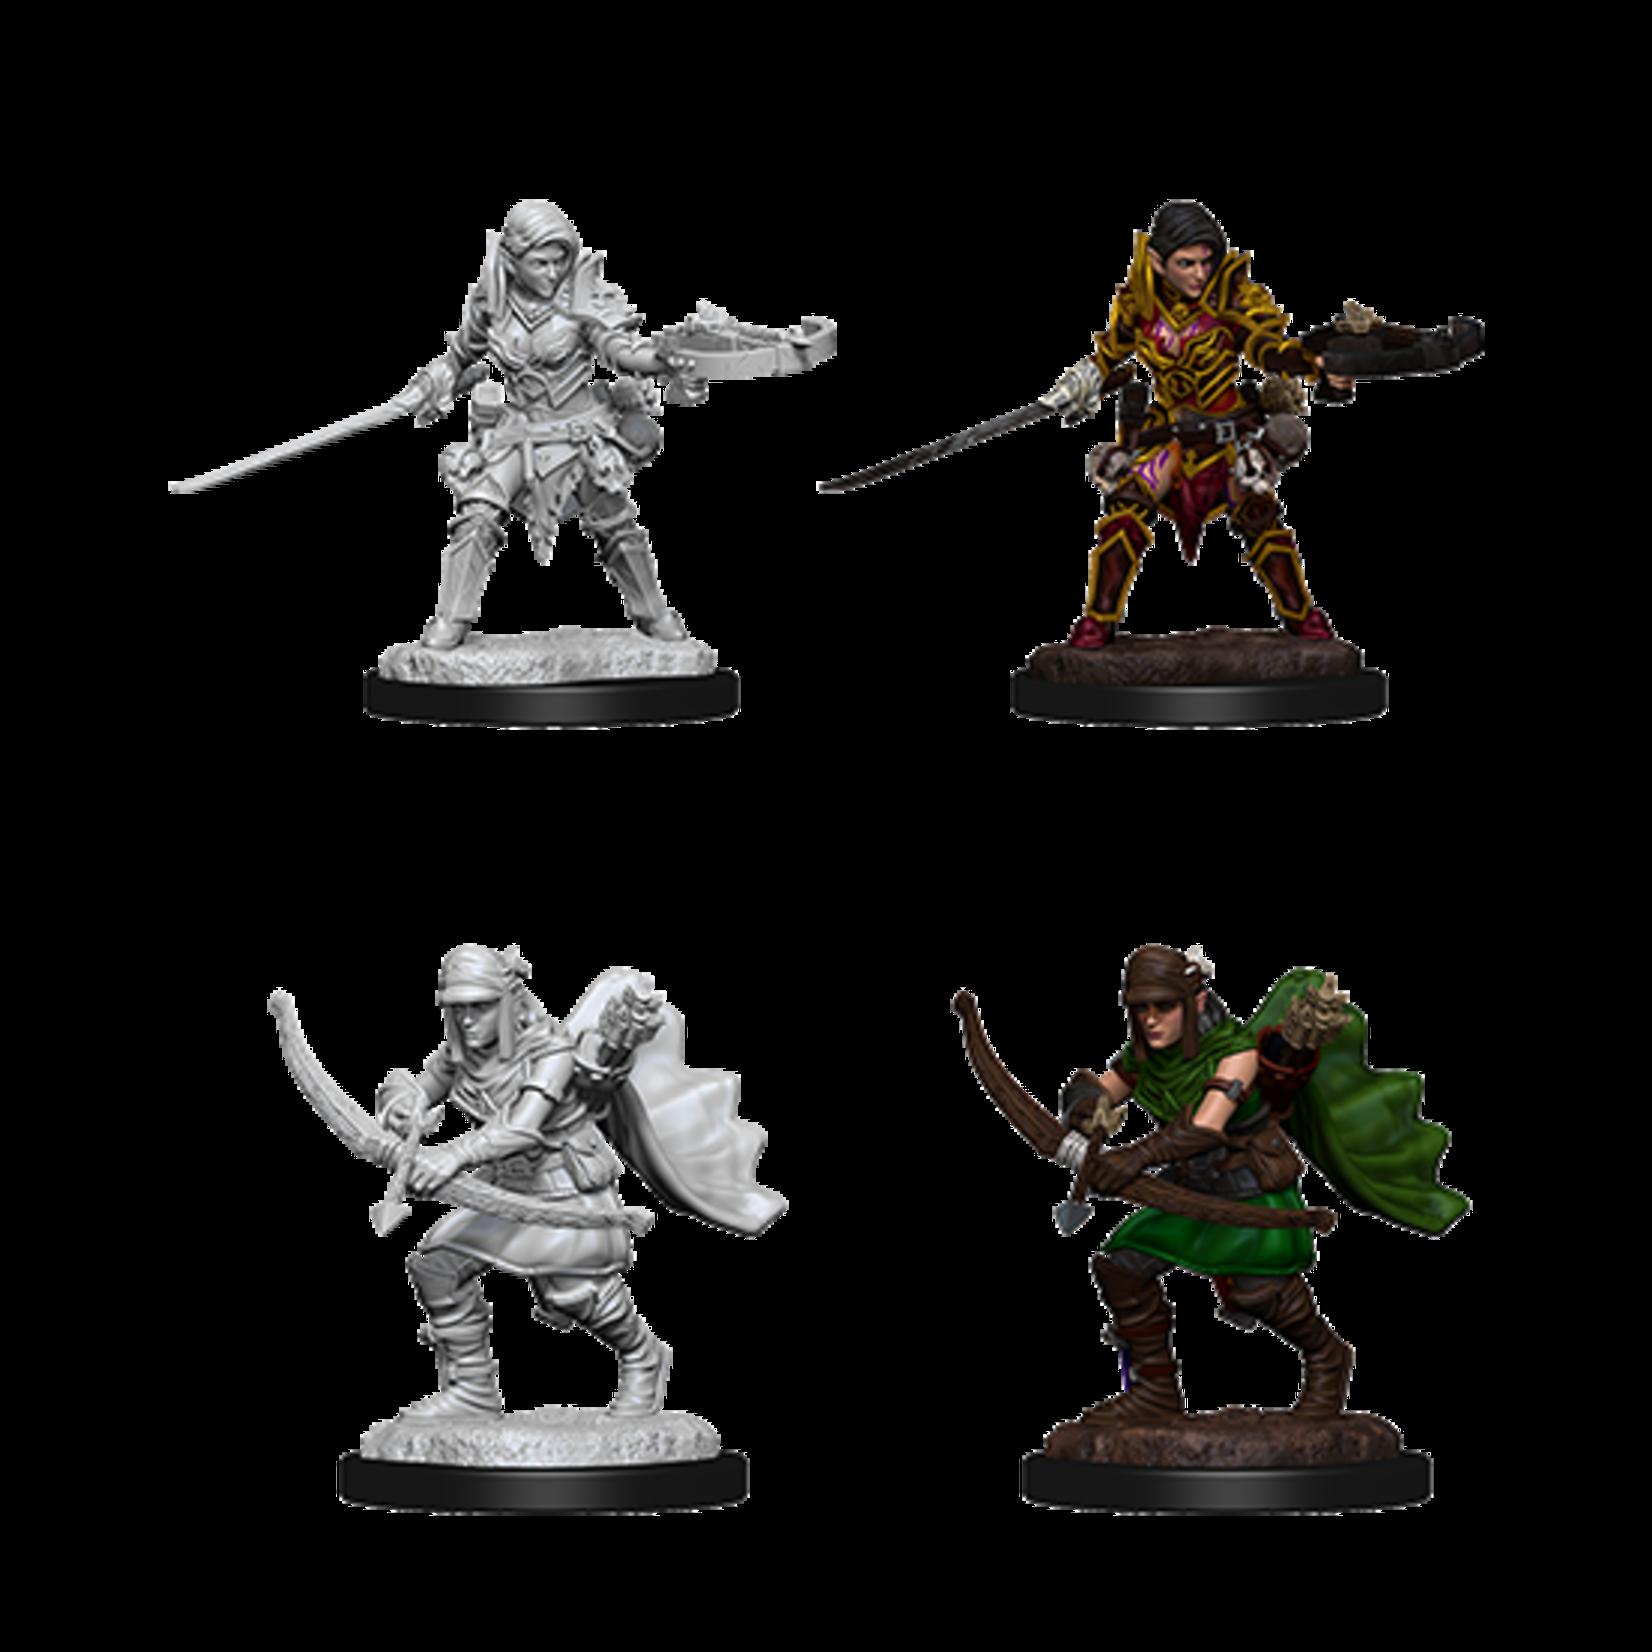 WizKids Pathfinder Battles Deep Cuts Unpainted Miniatures: Half-Elf Female Ranger (W7)